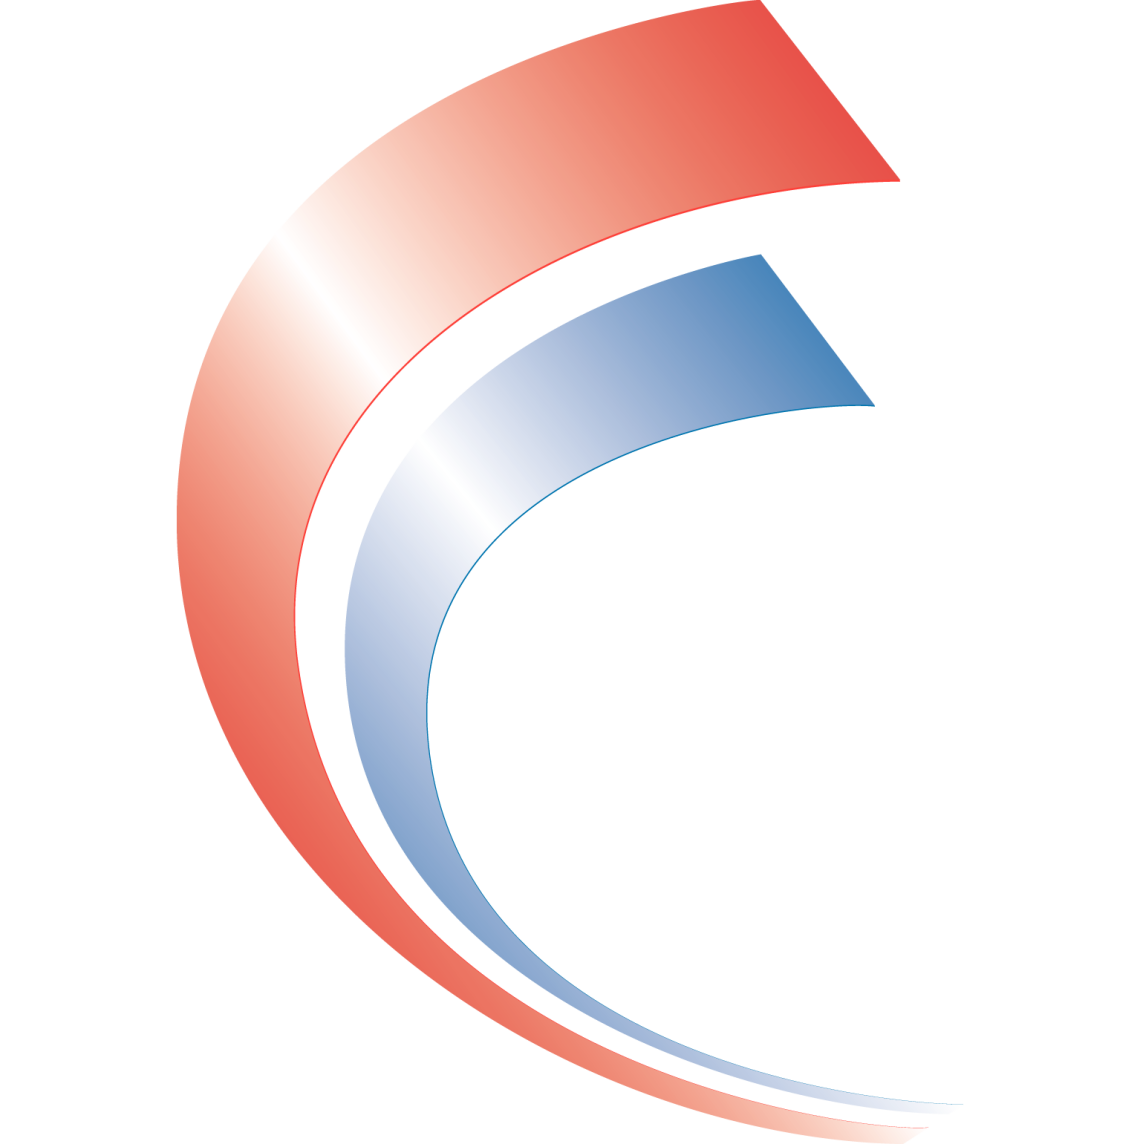 Lovtrom_symbol